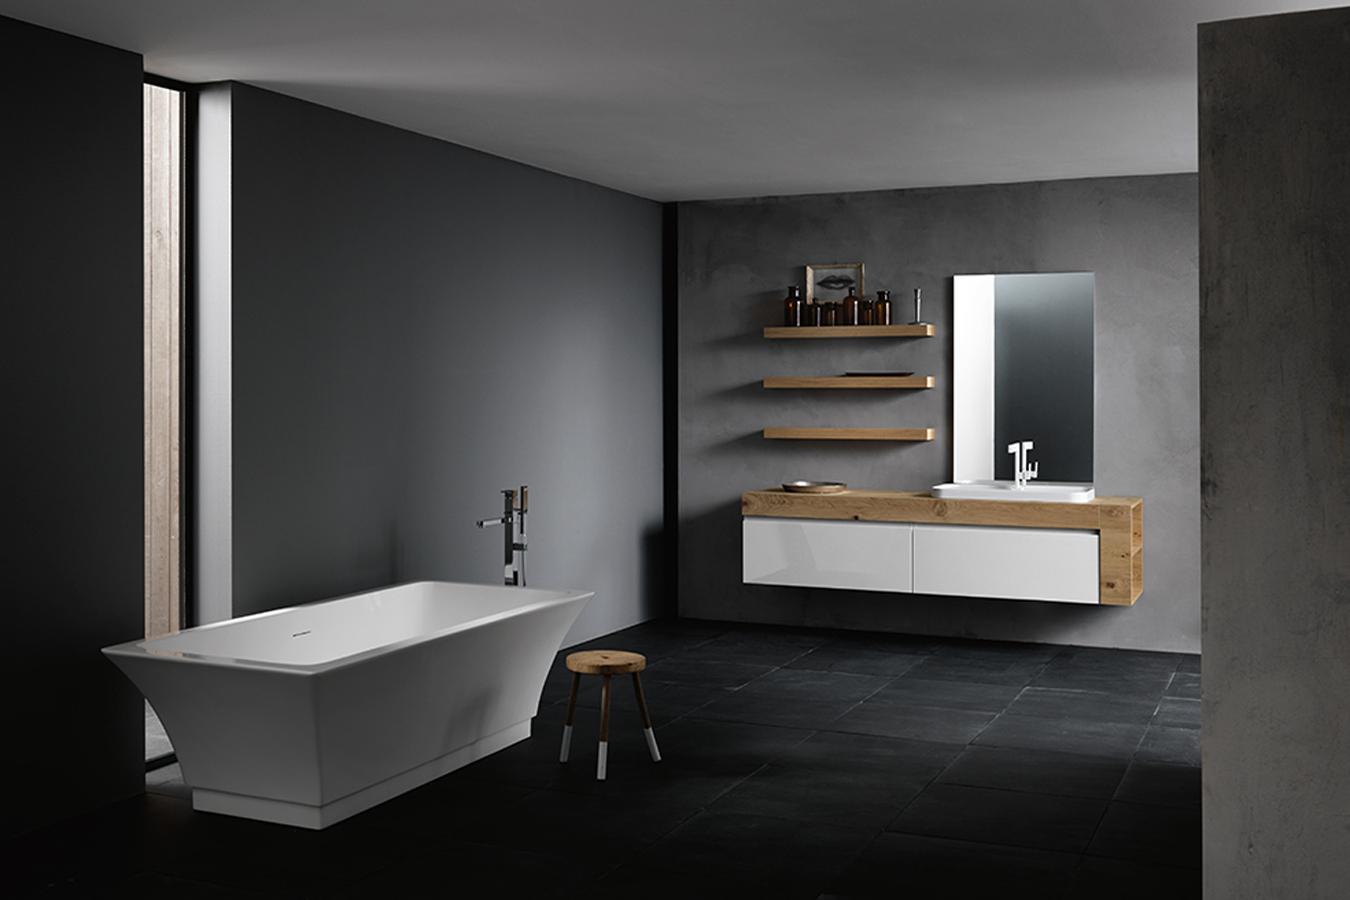 Arredo bagno programma ink righetti mobili novara - Mobili del bagno ...